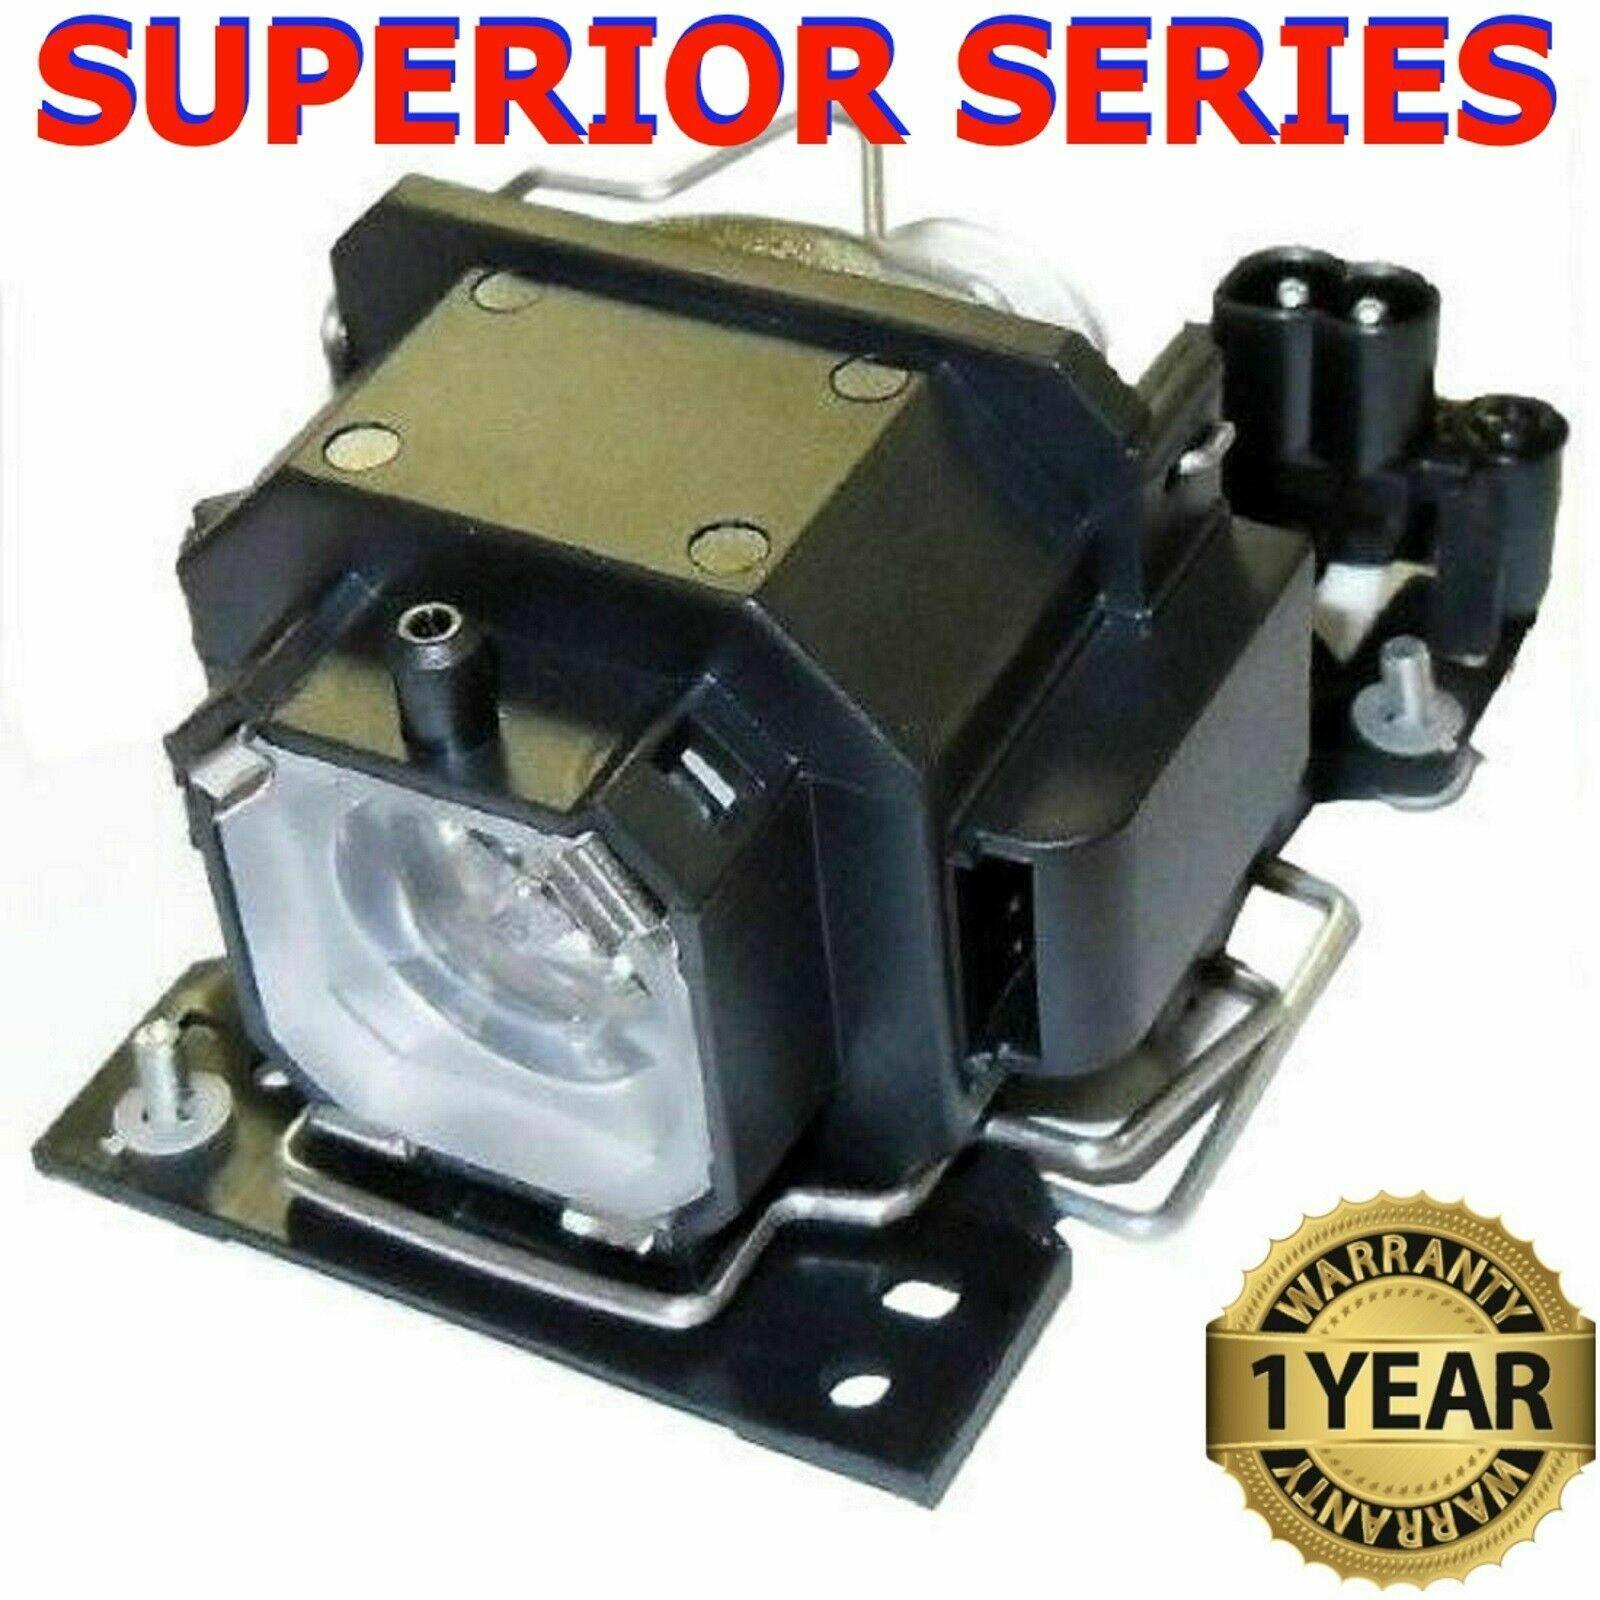 DT--00781 DT00781 E-SERIES BULB OR SUPERIOR SERIES LAMP FOR HITACHI PROJECTORS - $21.80 - $87.00